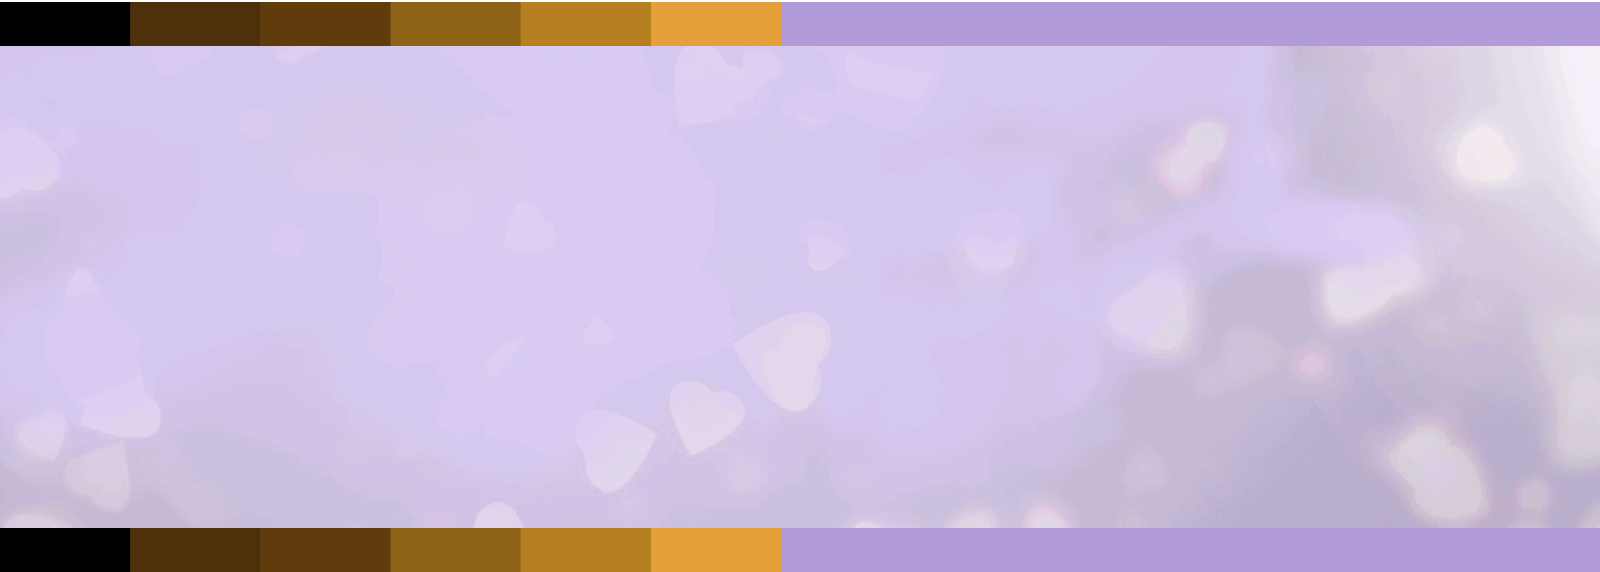 8 Color Shades